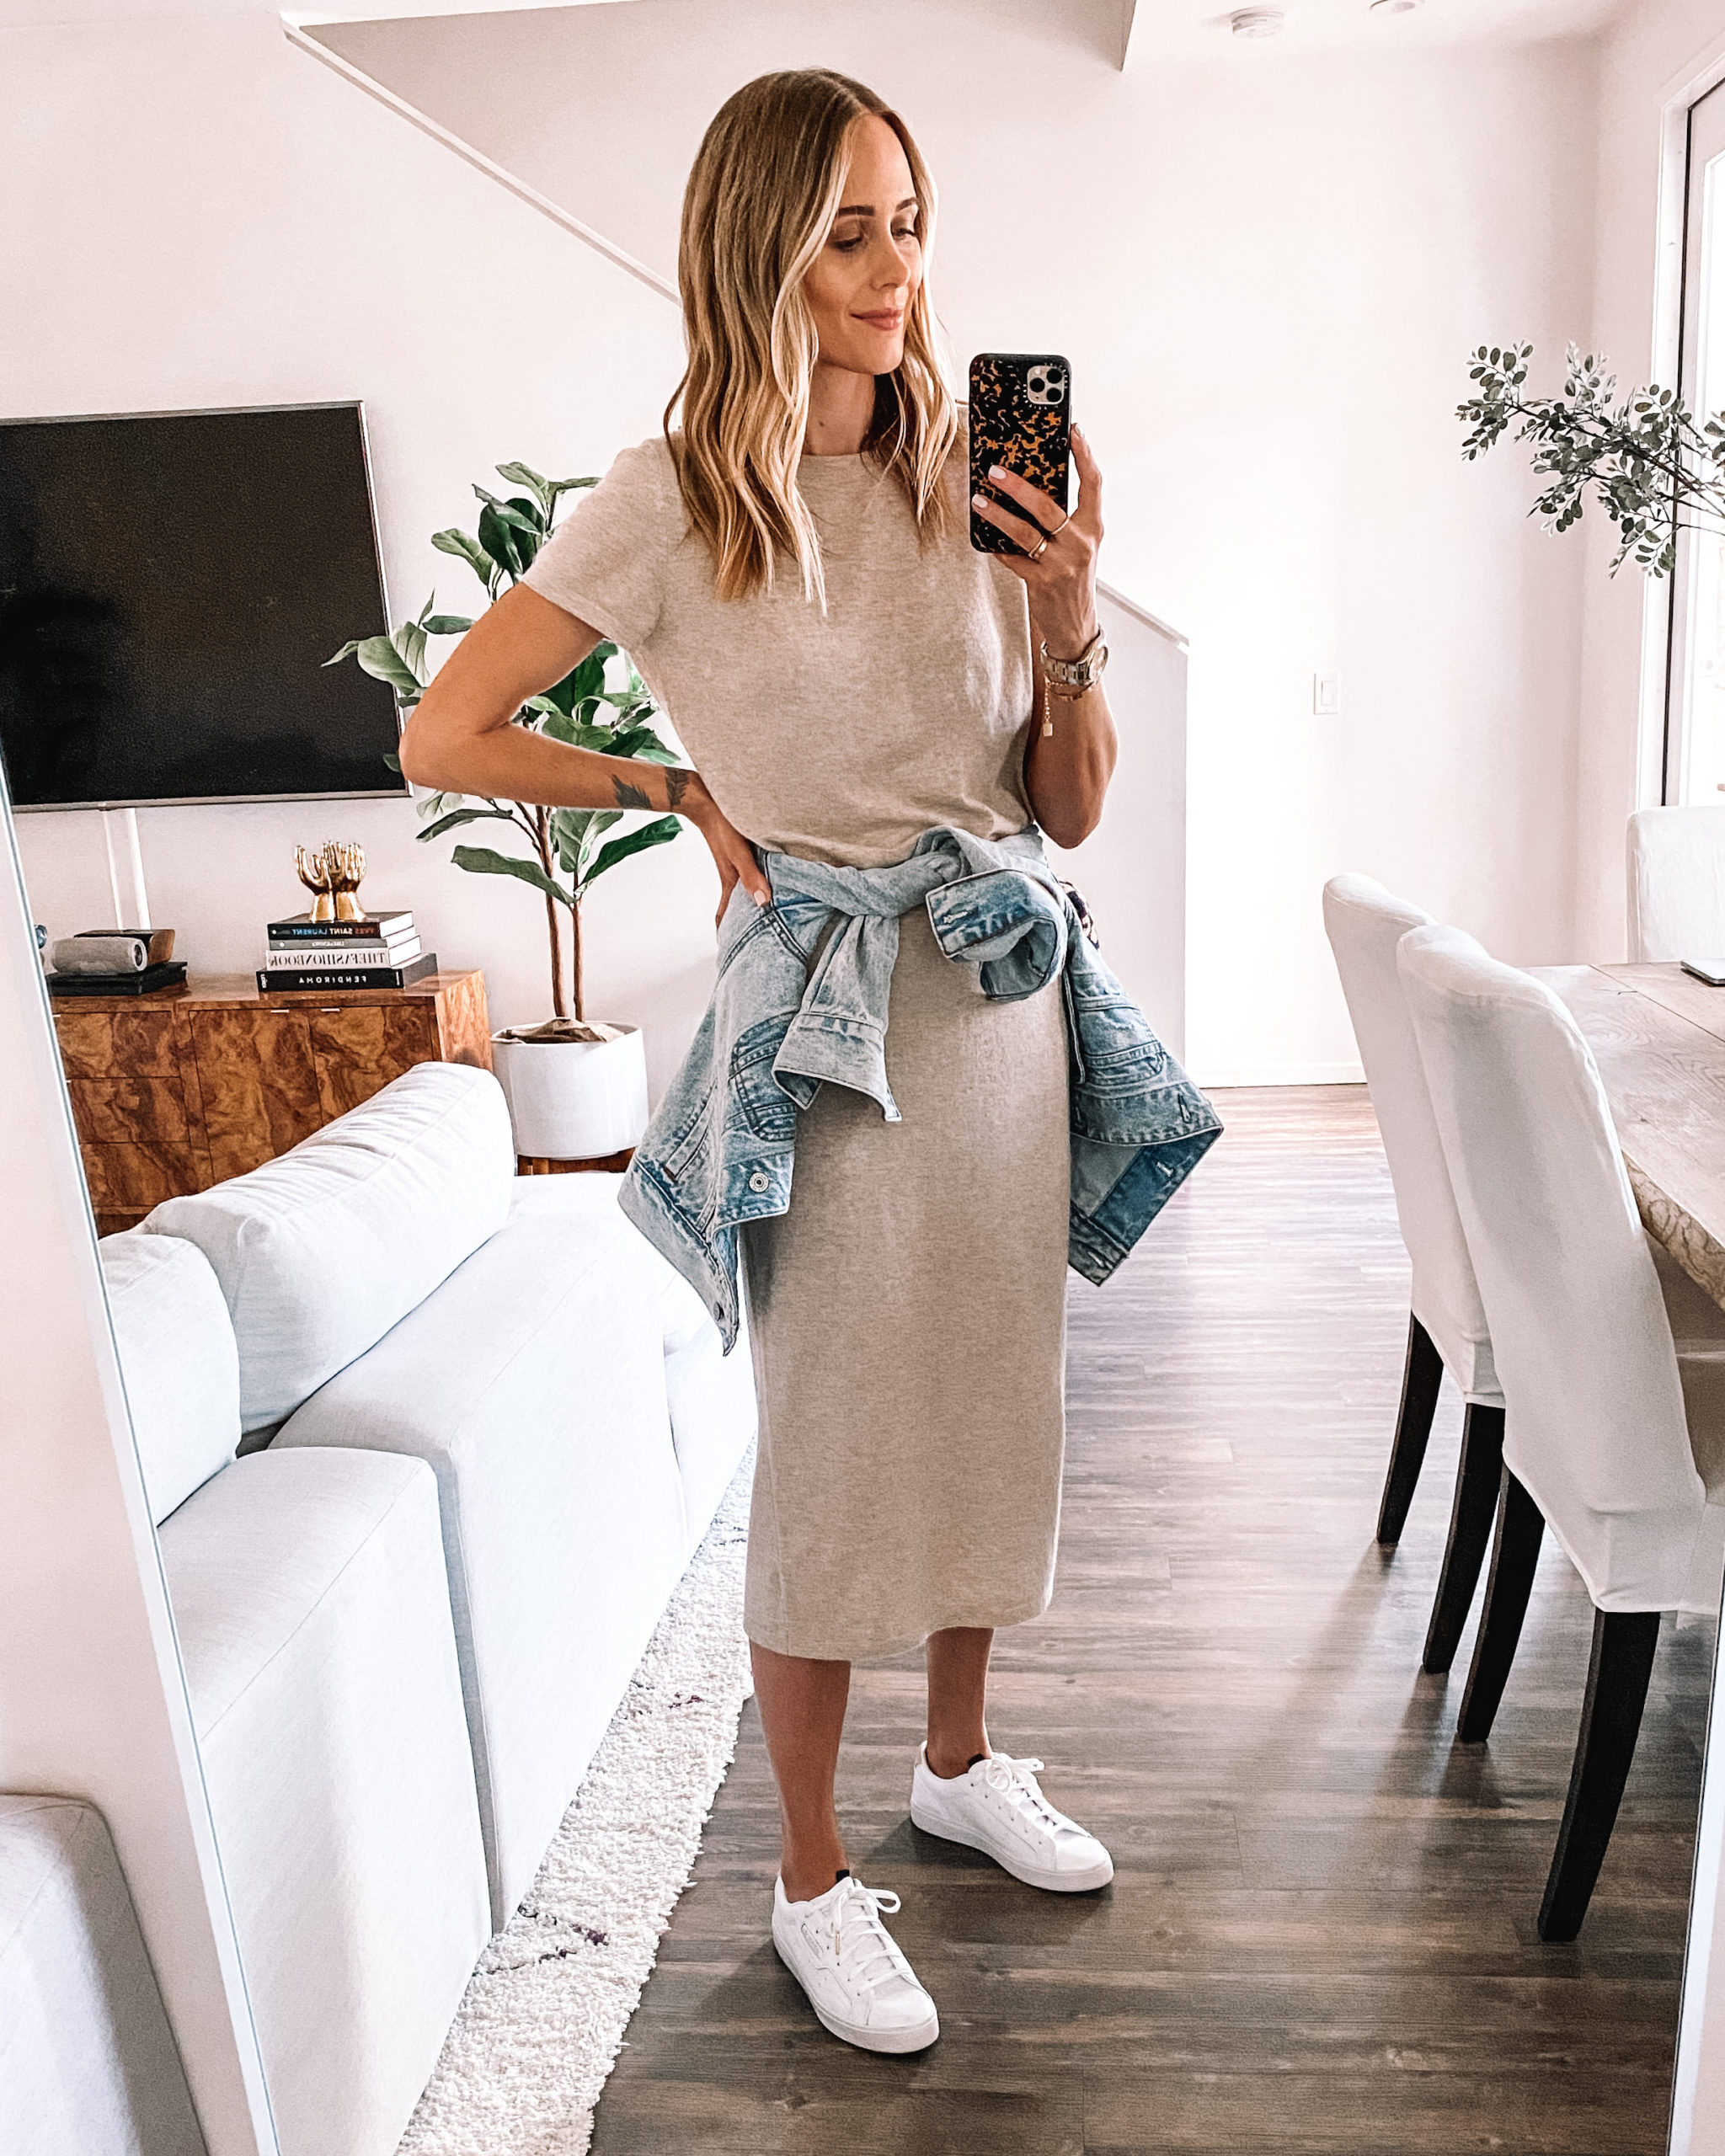 Fashion Jackson Wearing Jenni Kayne Tshirt Dress Denim Jacket adidas White Sneakers